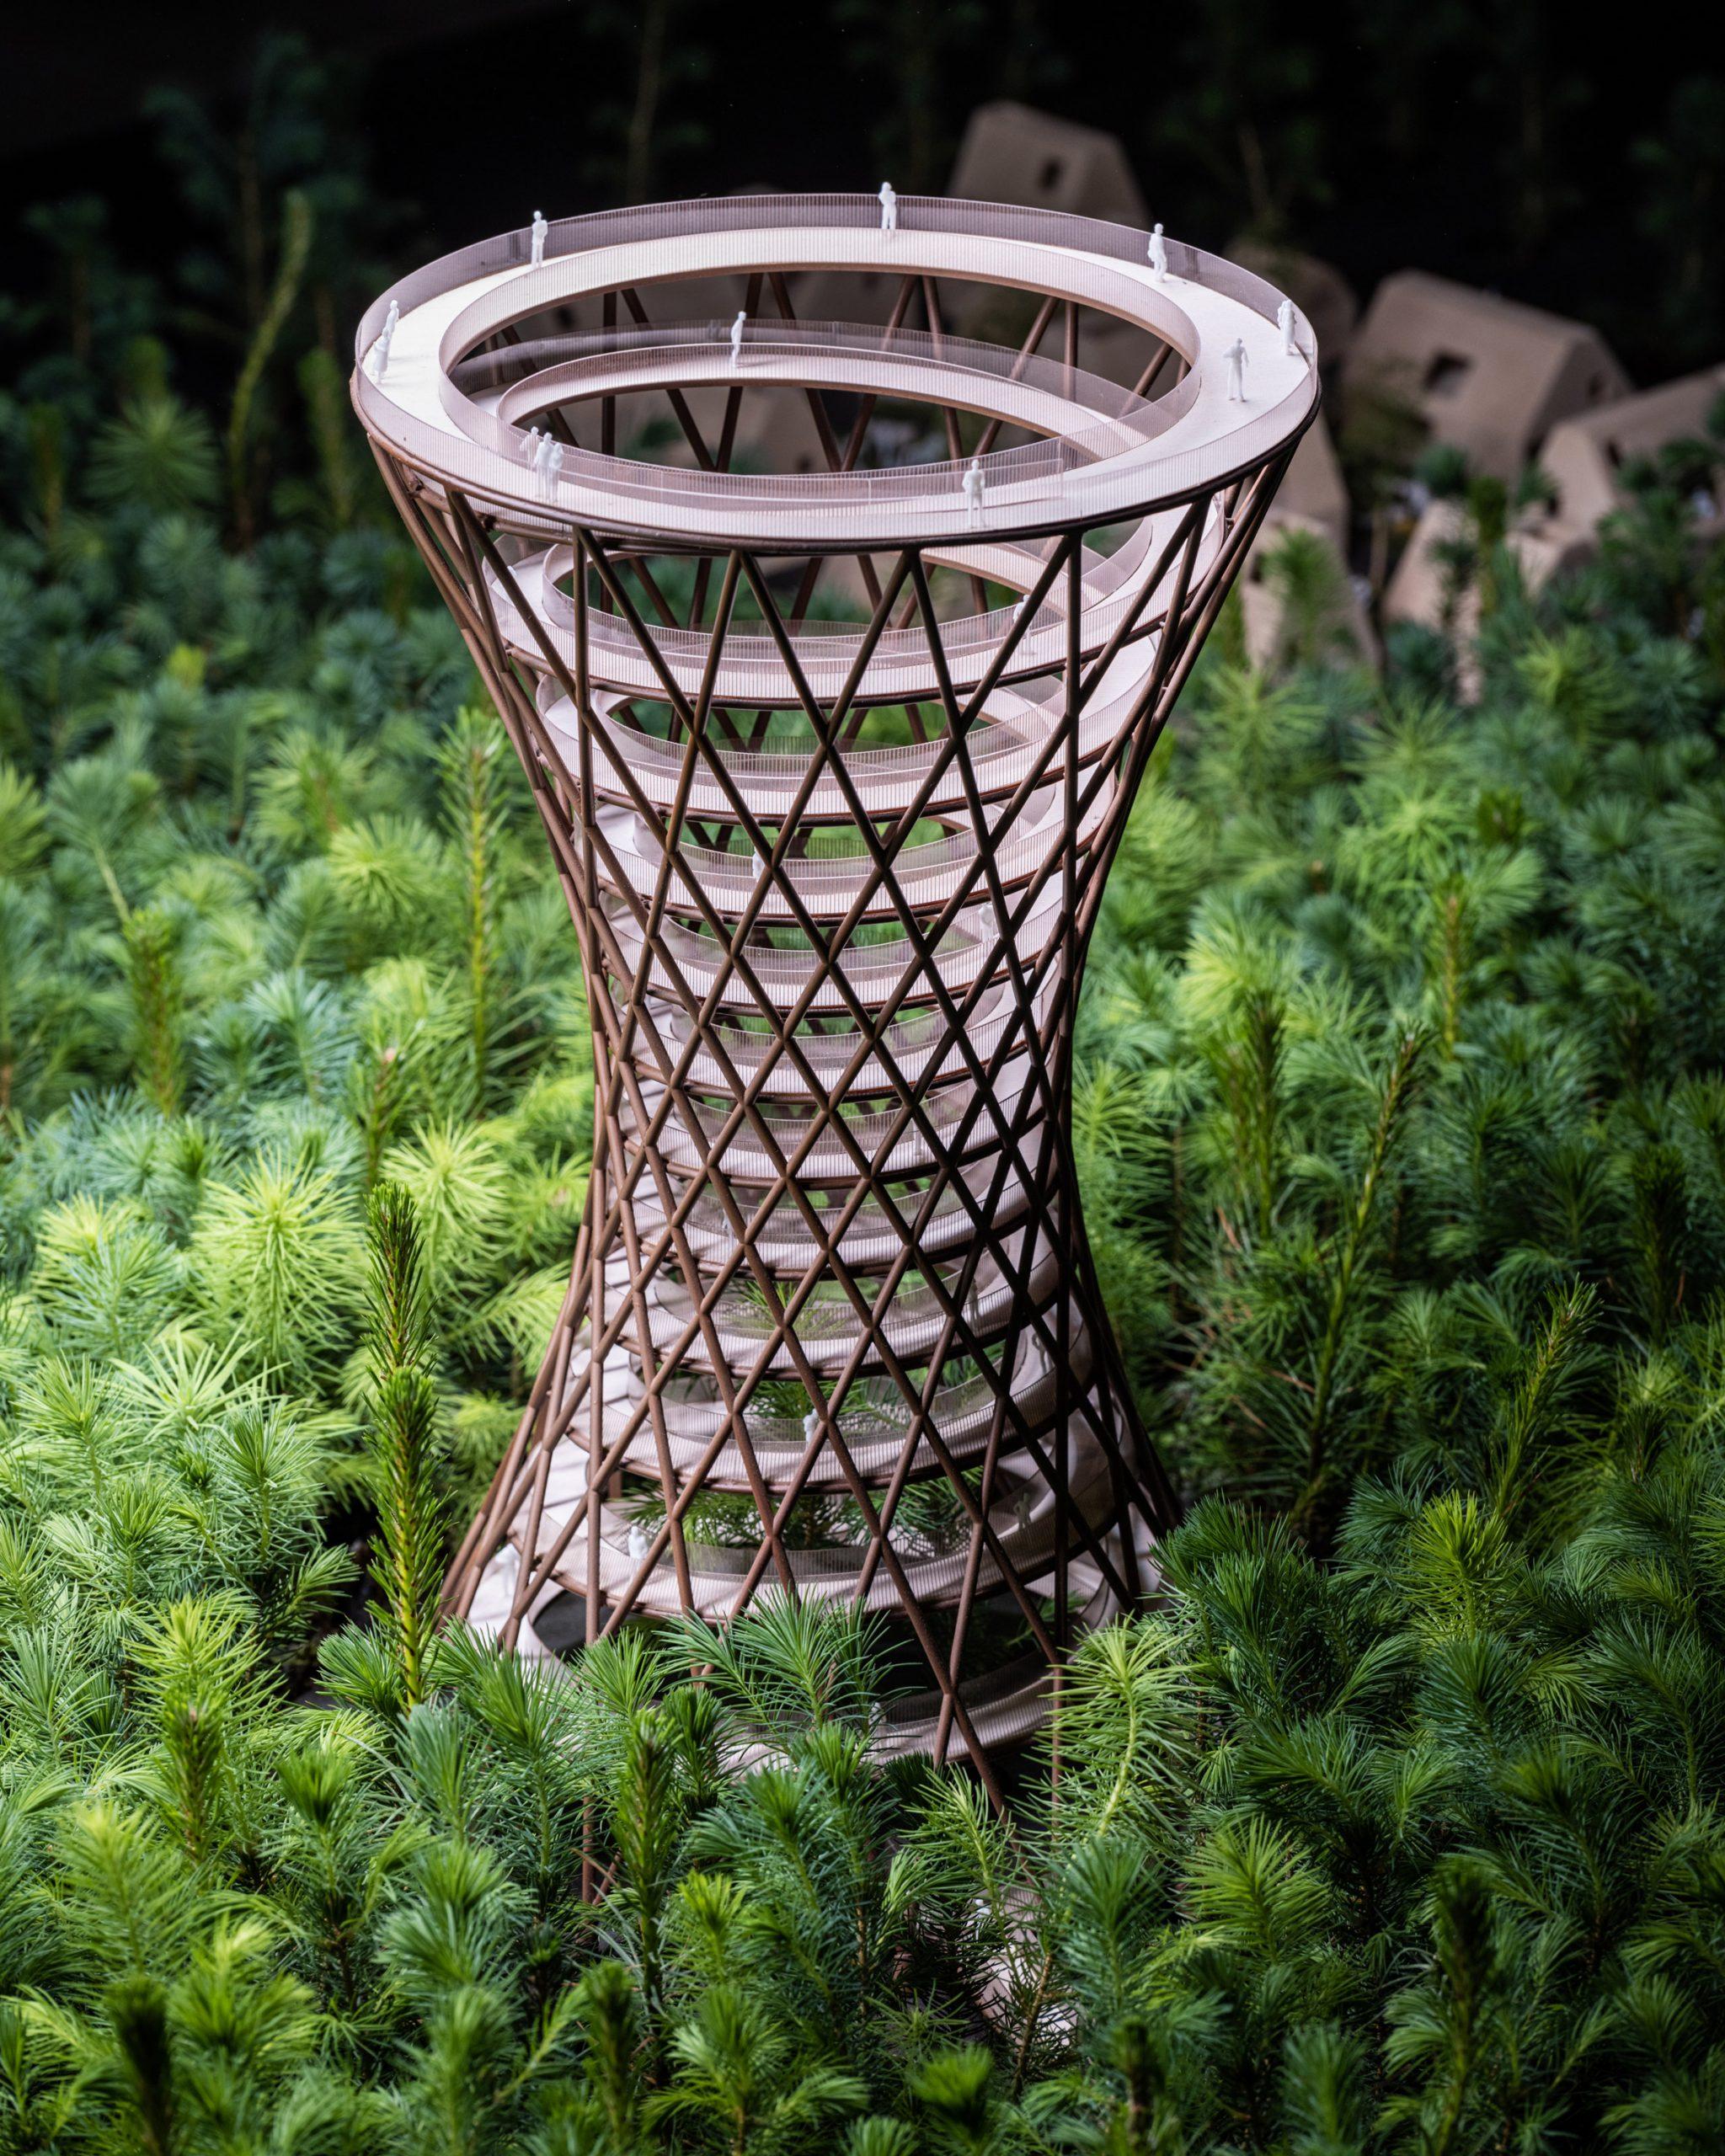 Architectural model of EFFEKT's forest tower